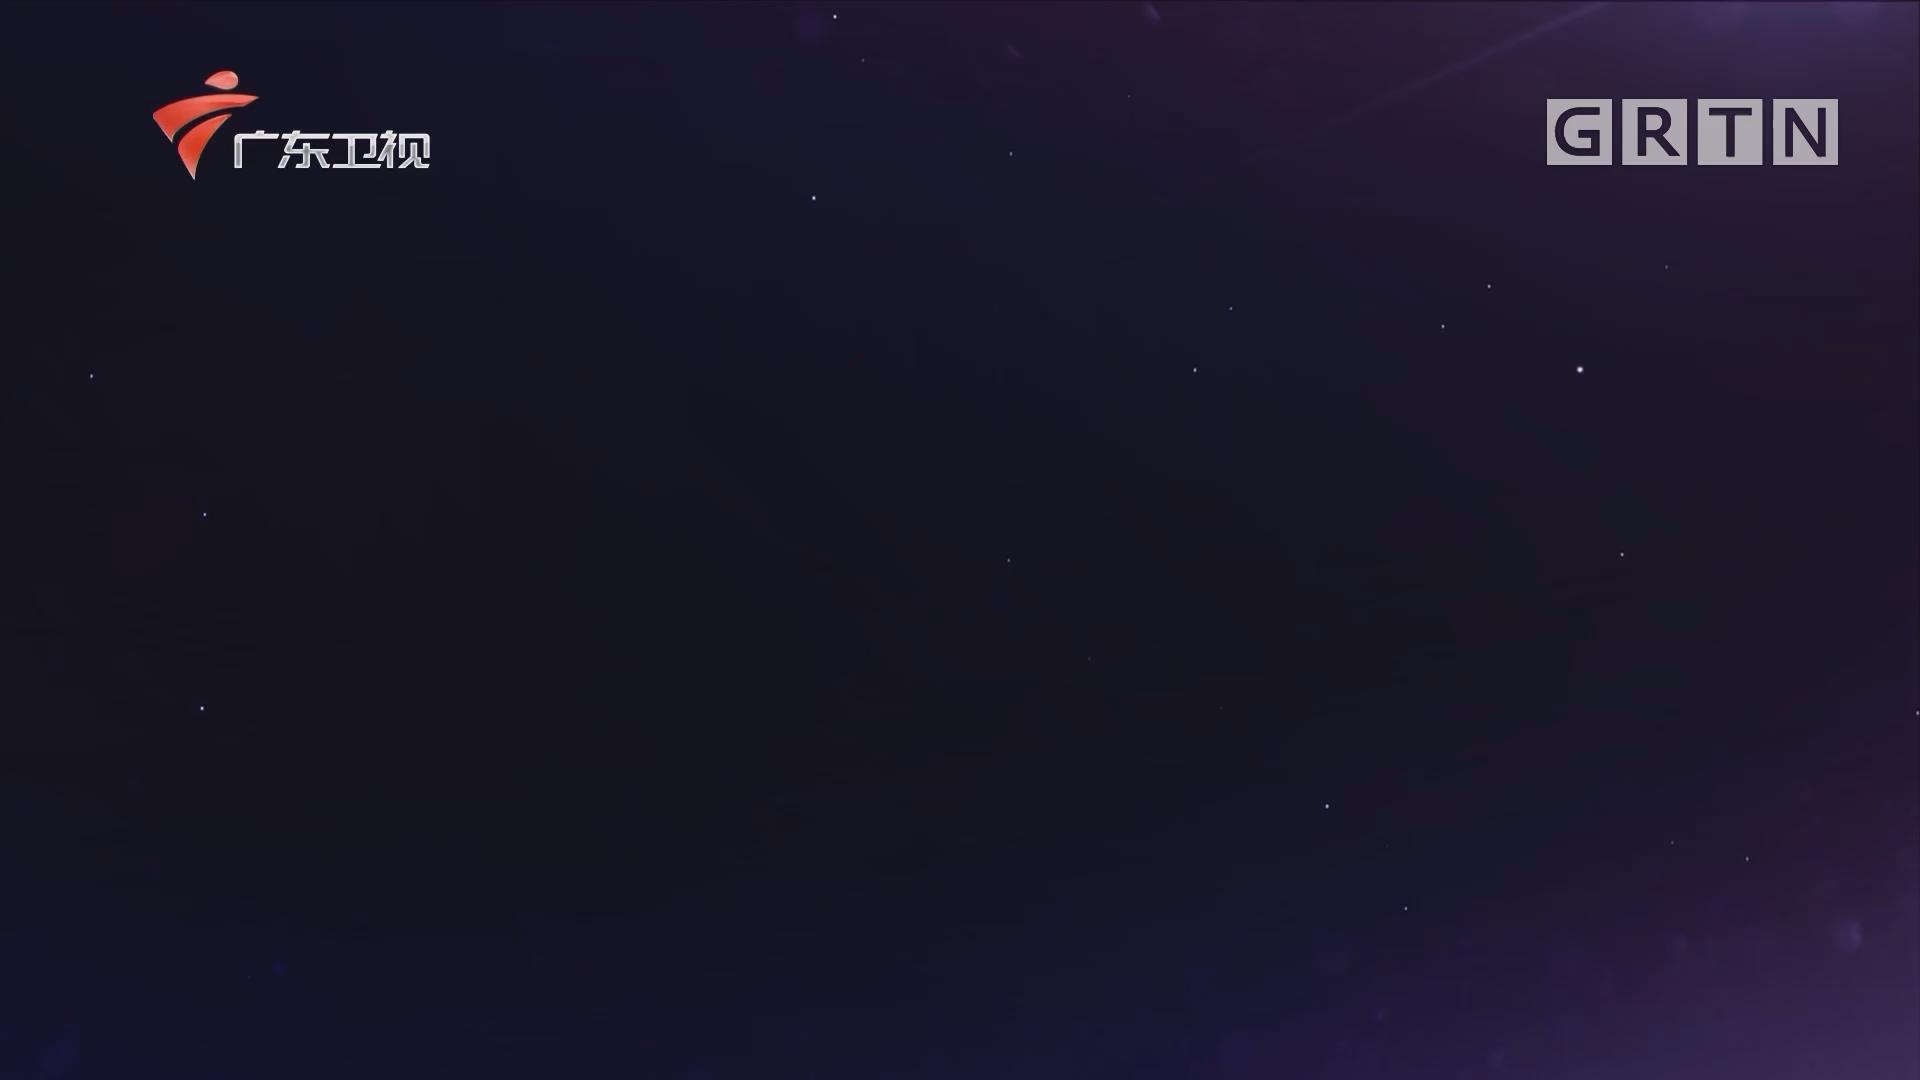 [HD][2020-01-31]晚间新闻:李希到广州调研检查疫情防控工作 落细落实防控工作举措 筑牢筑密群防群治防线